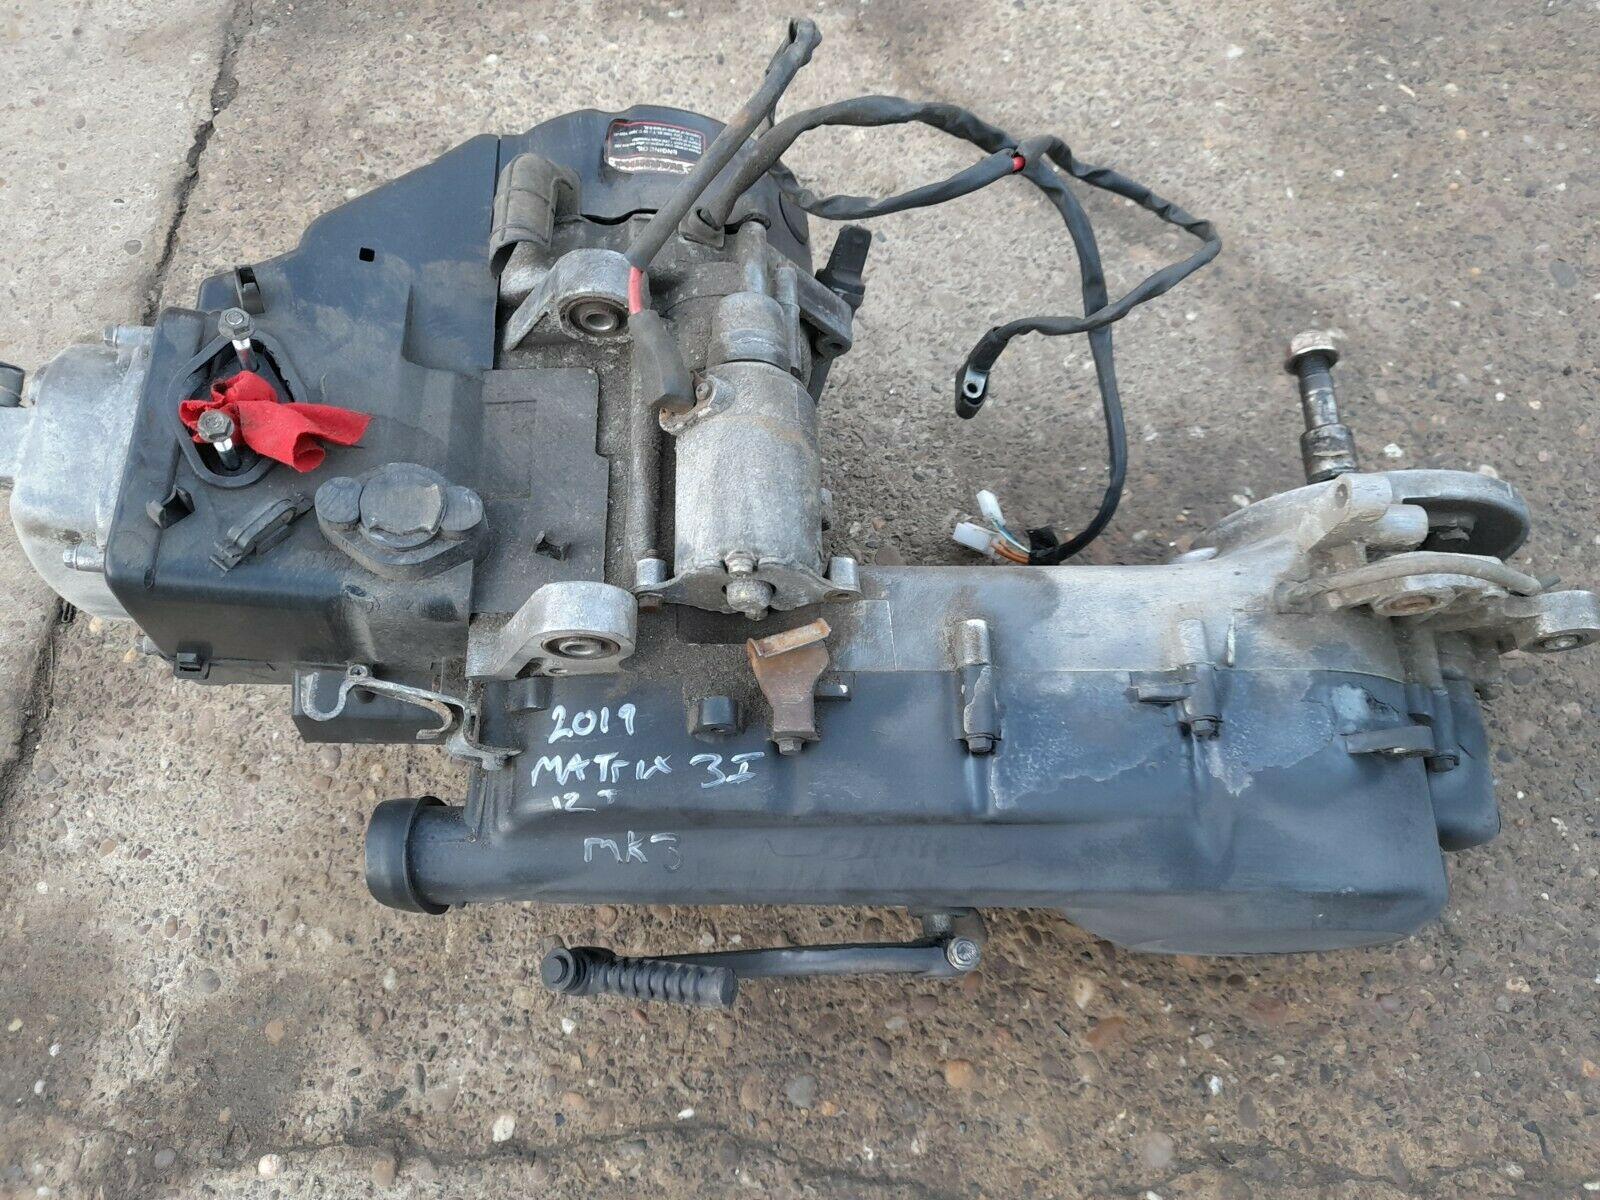 sinnis-matrix-3-3i-125-engine-motor-working.jpg